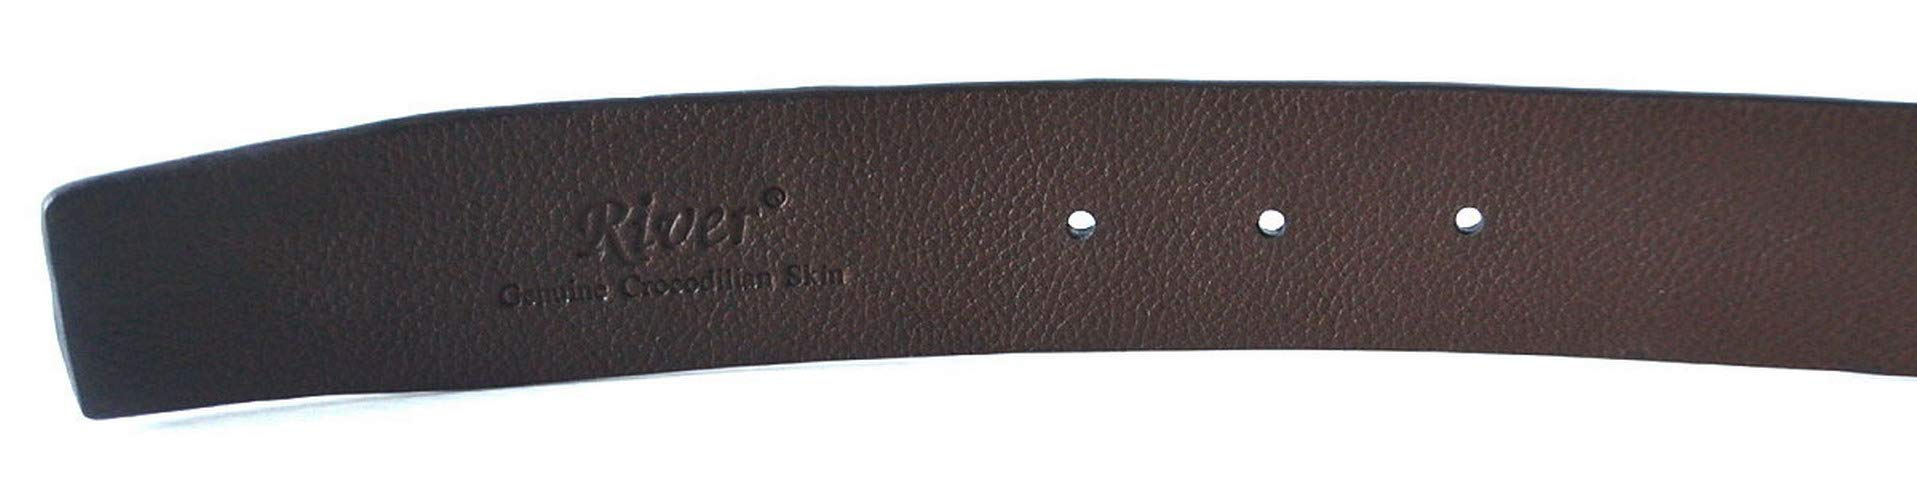 Authentic River Crocodile Skin Men's Big Hornback Pin Belt 34''-36''Drak Brown